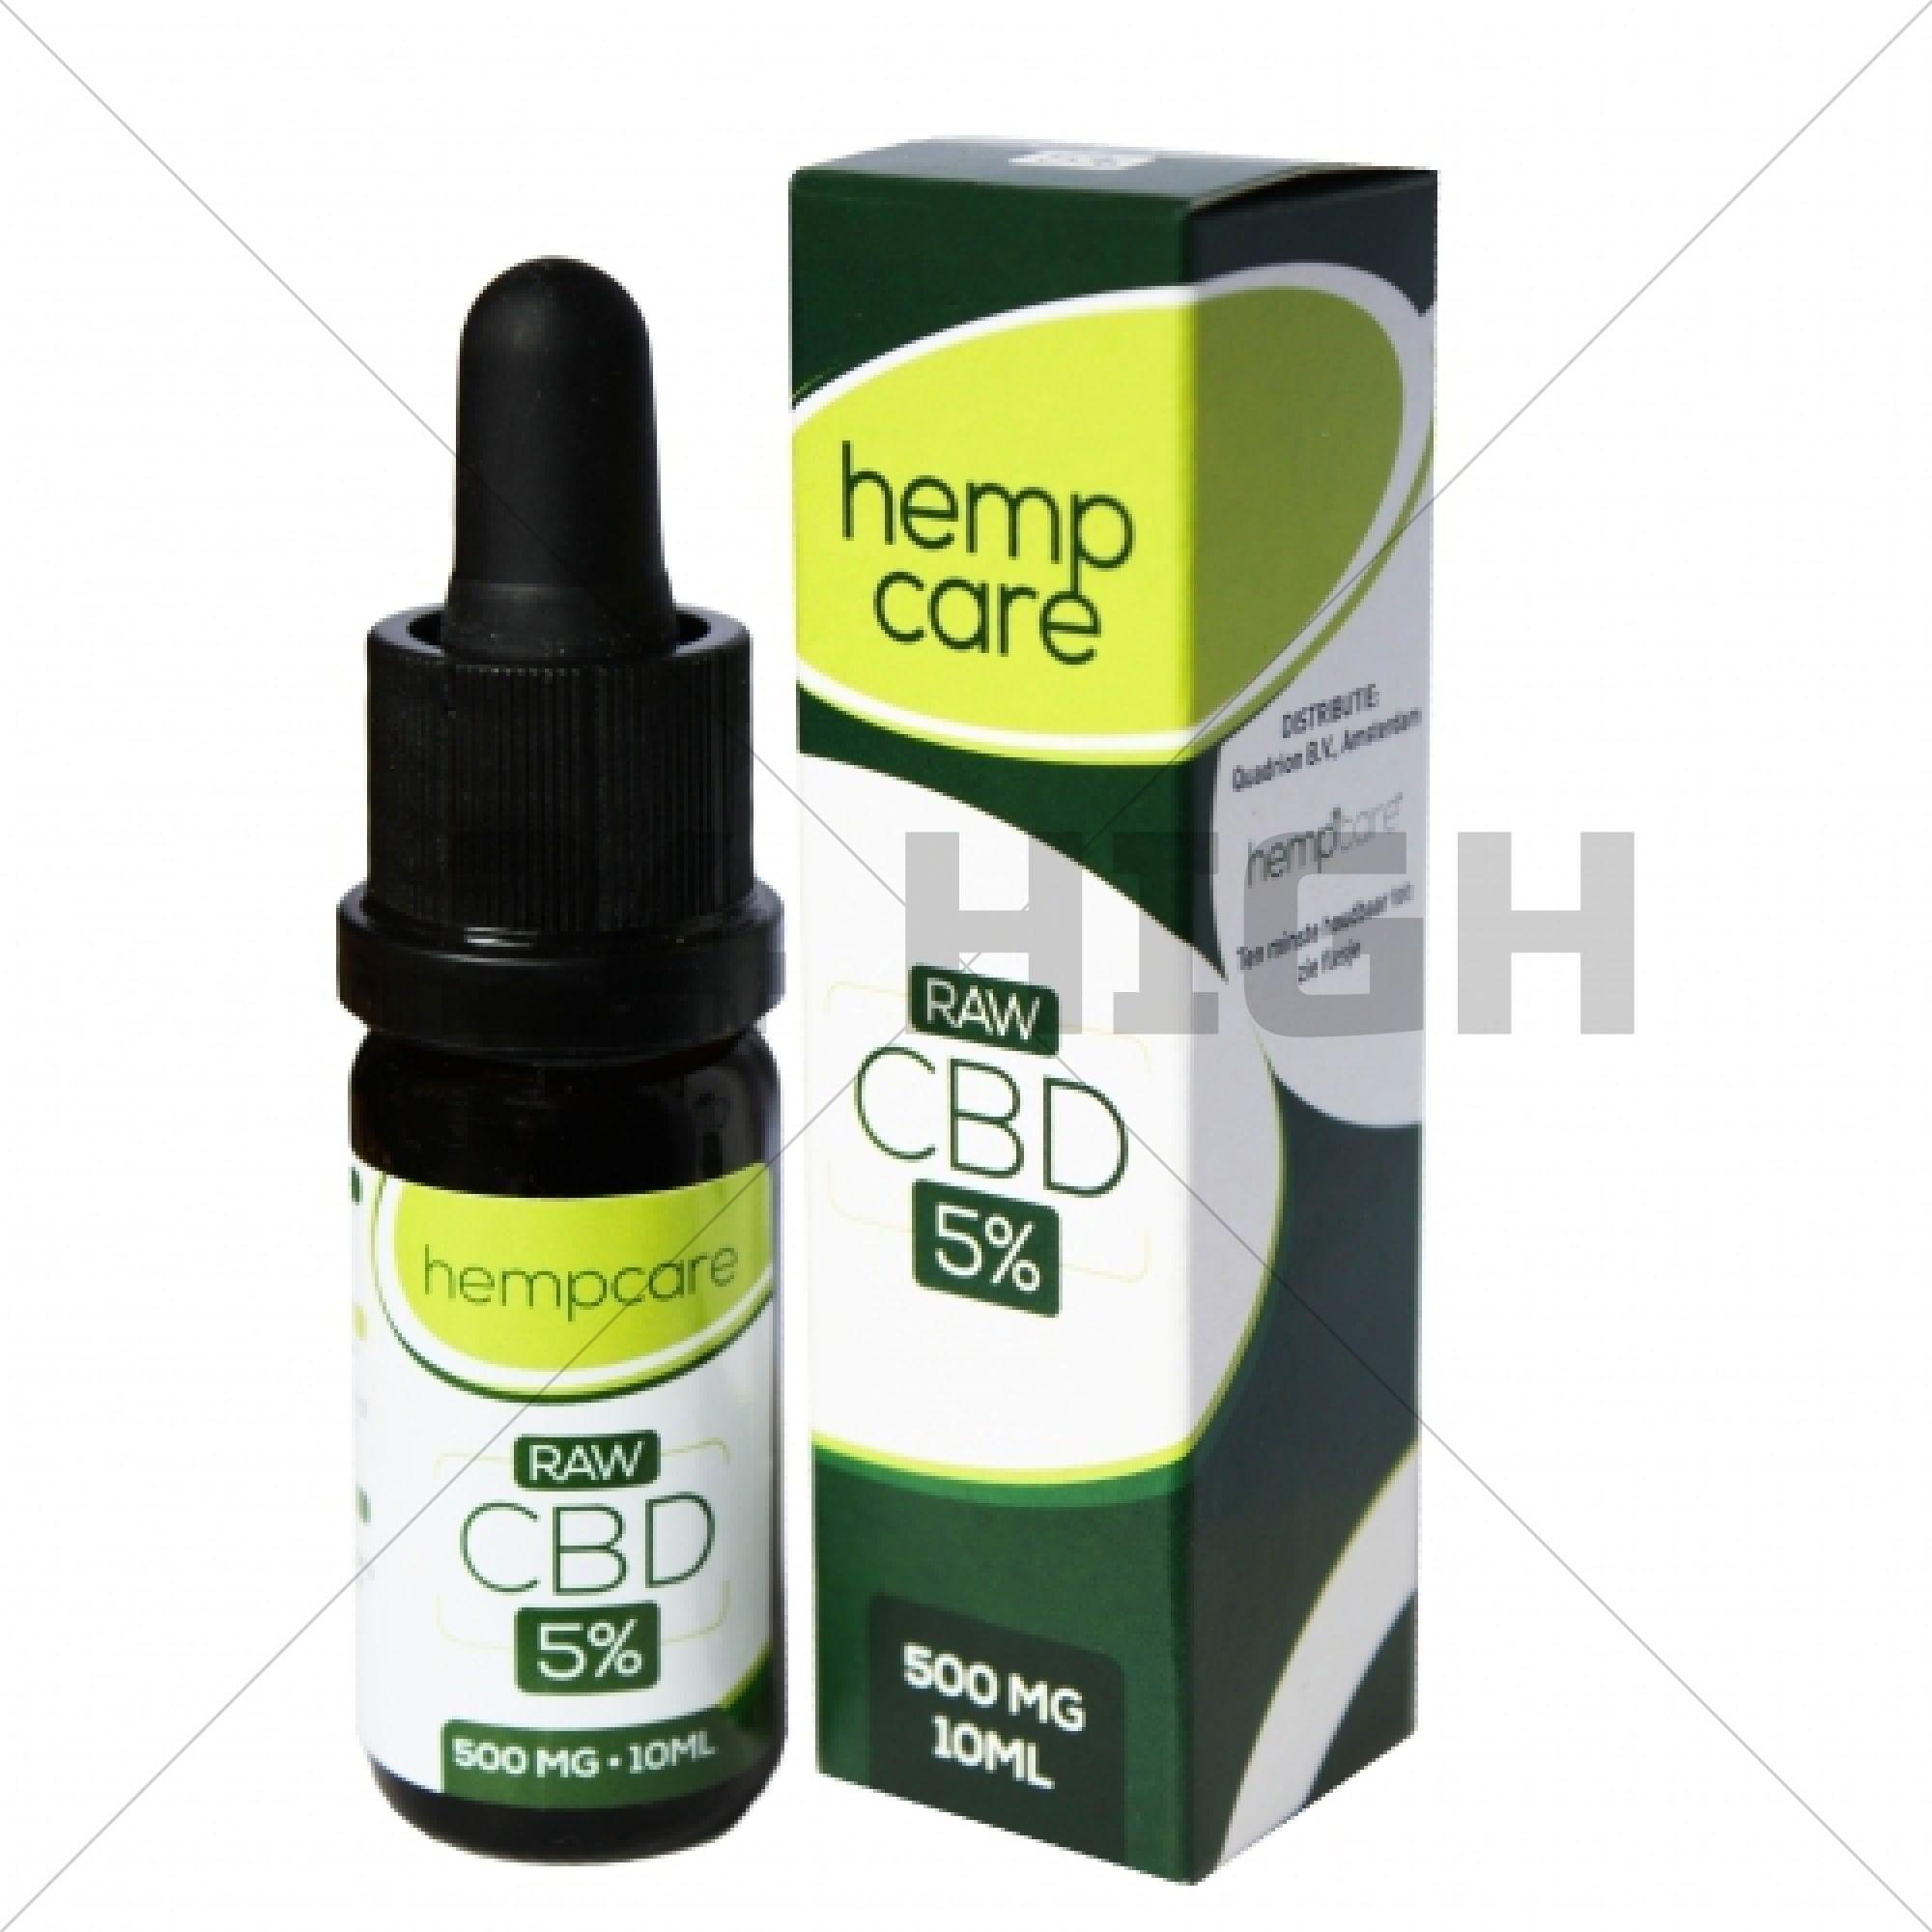 Hempcare RAW - 5% CBD